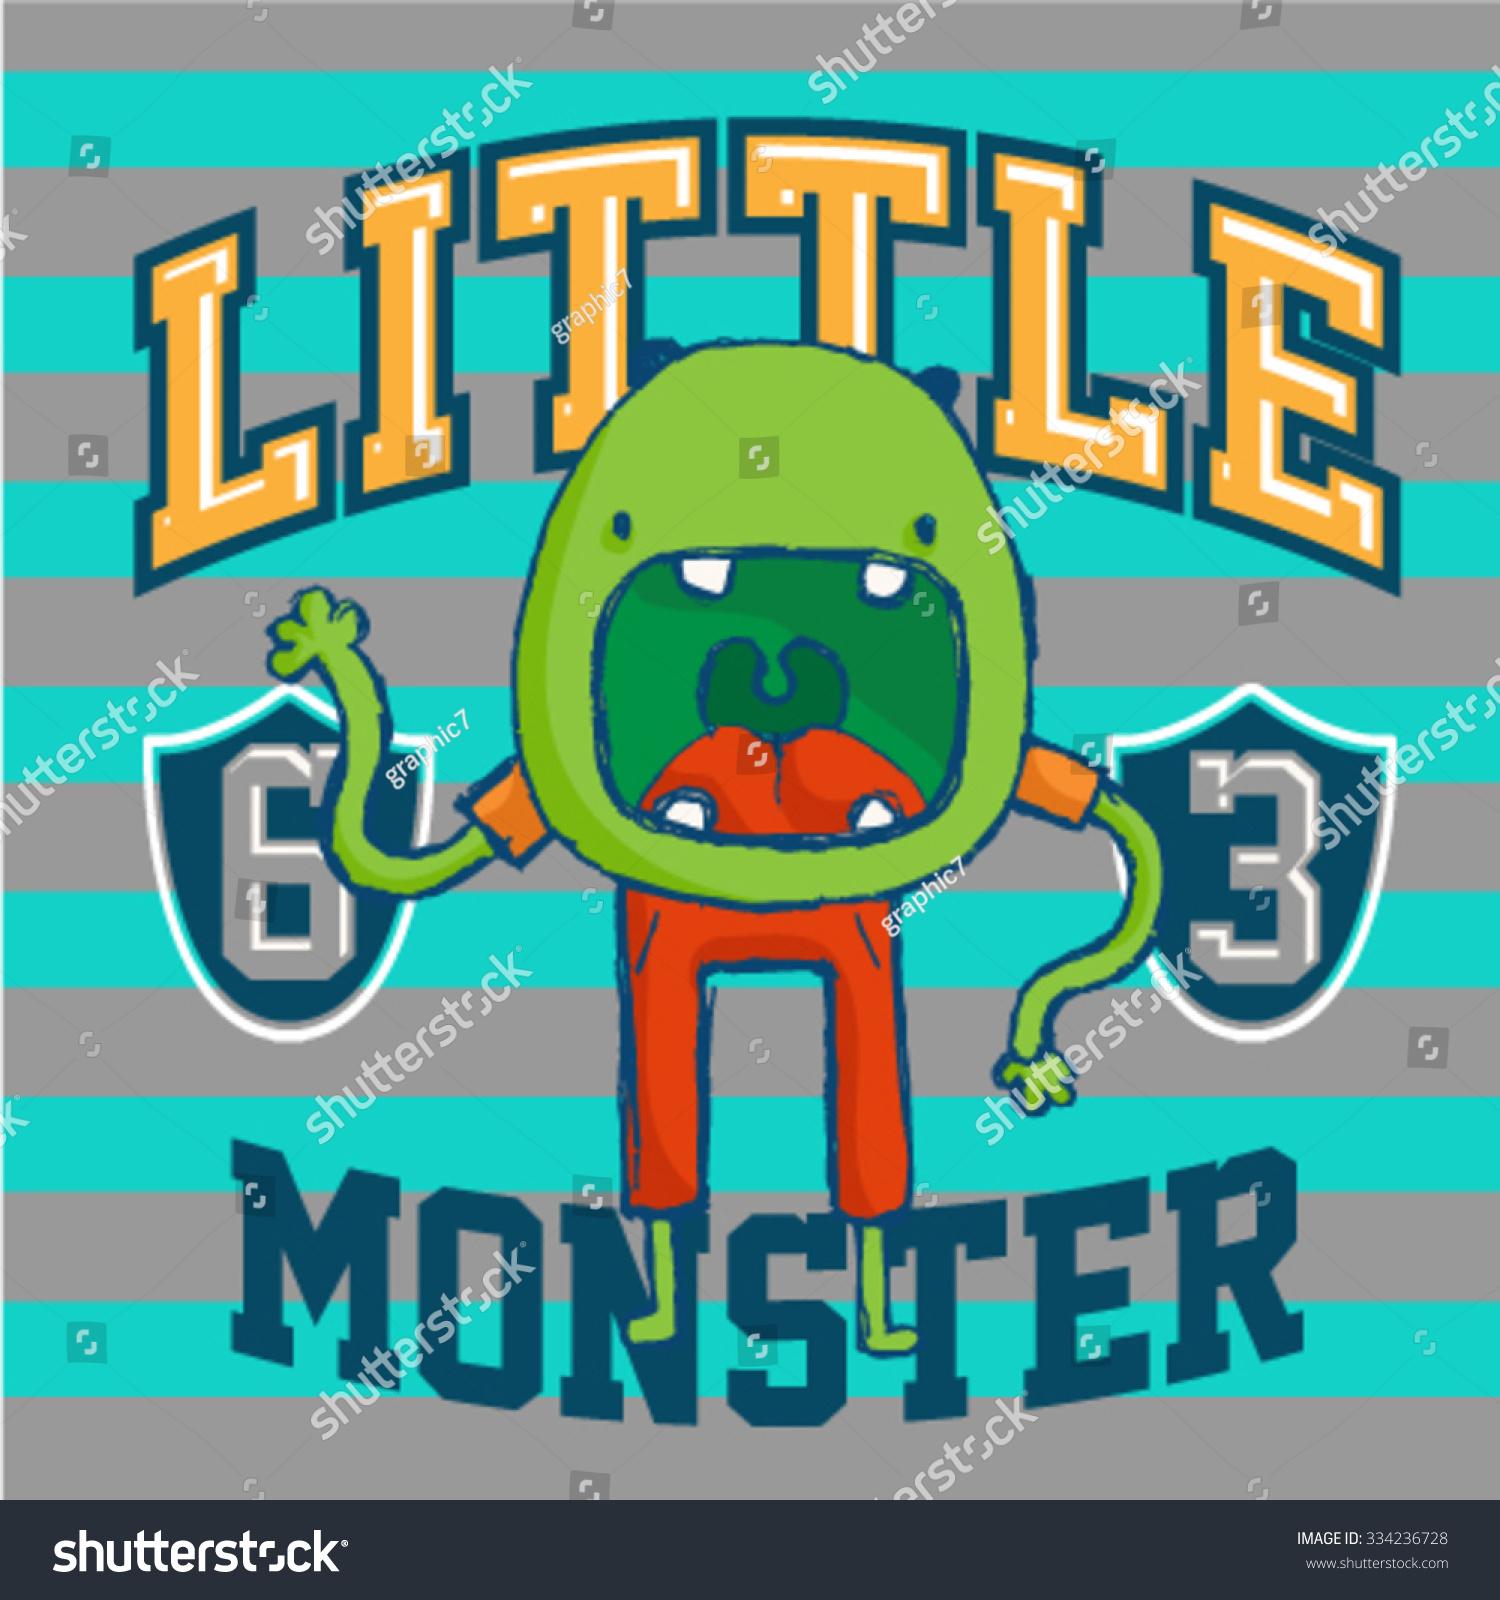 Little Monster Vintage Garment Design For Children Vector DesignInterior Elements Kids